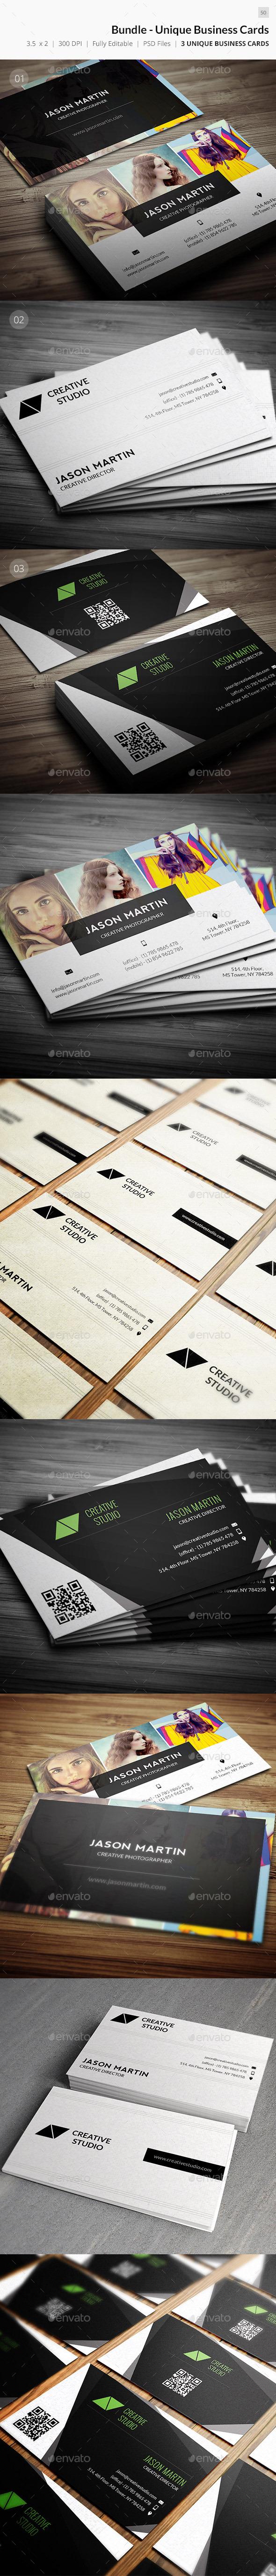 Bundle - Creative Business Cards - 50 - Creative Business Cards